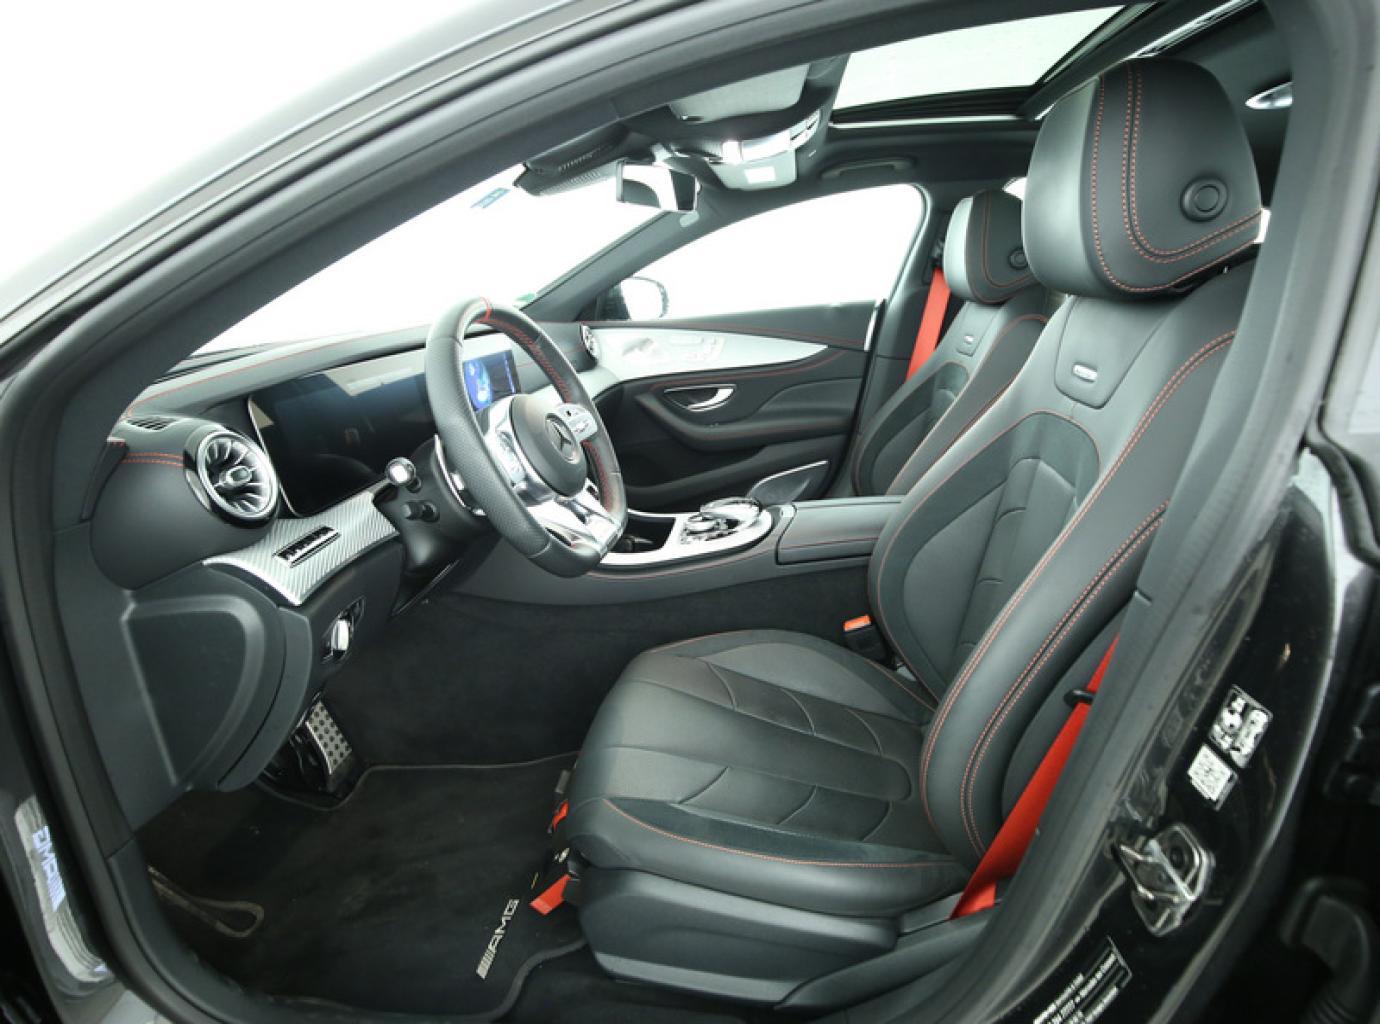 Mercedes-Benz CLS 53 AMG 4M+ PERFEKT AUSGETATTET! NP:EU124.420, Jahr 2019, Benzin